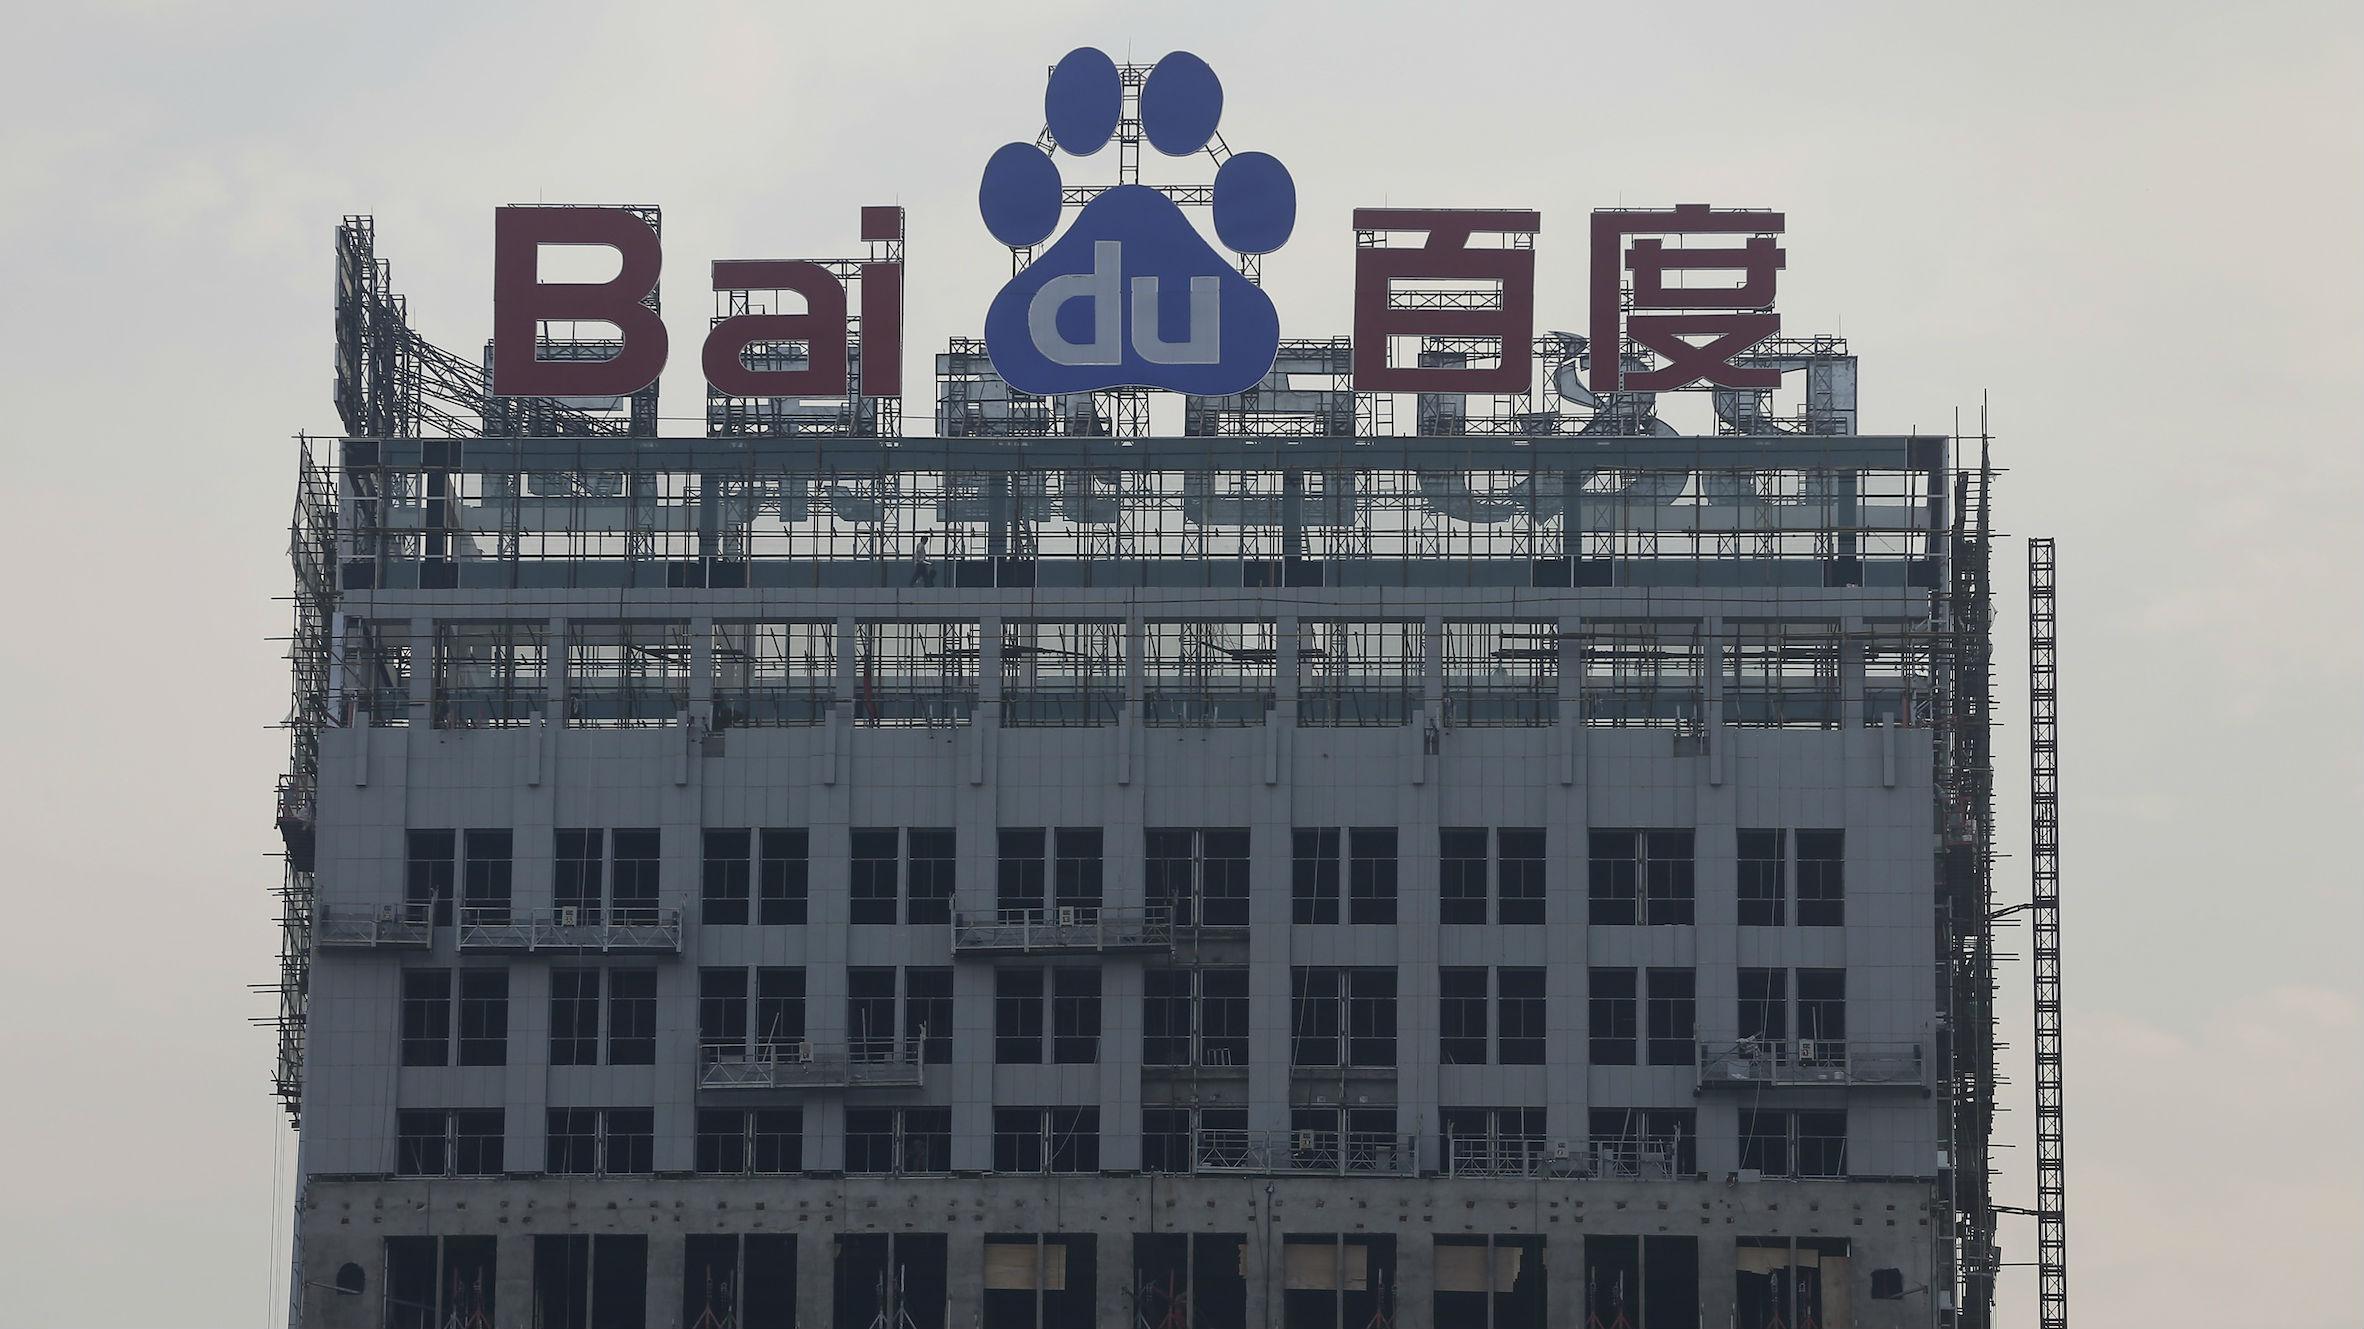 Baidu's expansion continues.